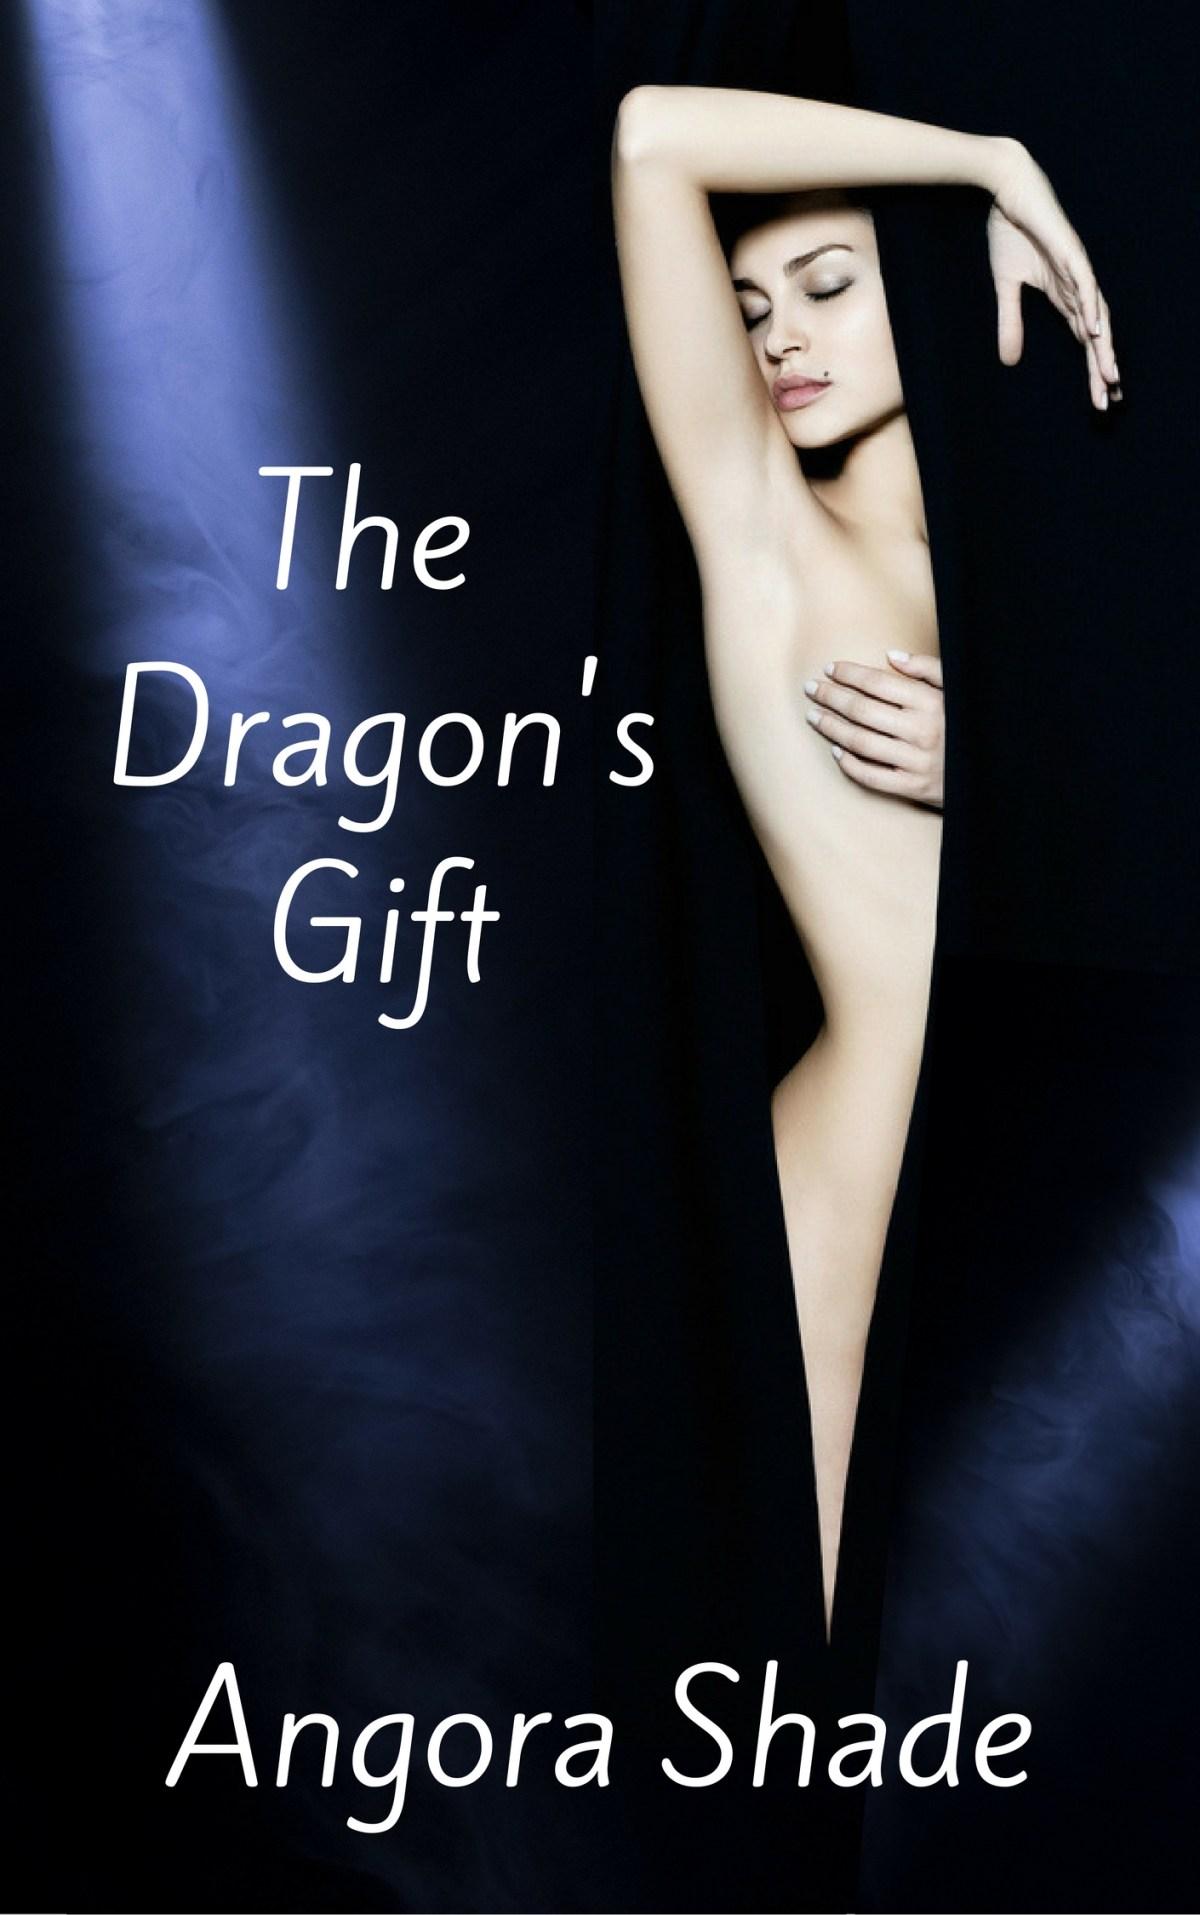 The Dragon's Gift by Angora Shade